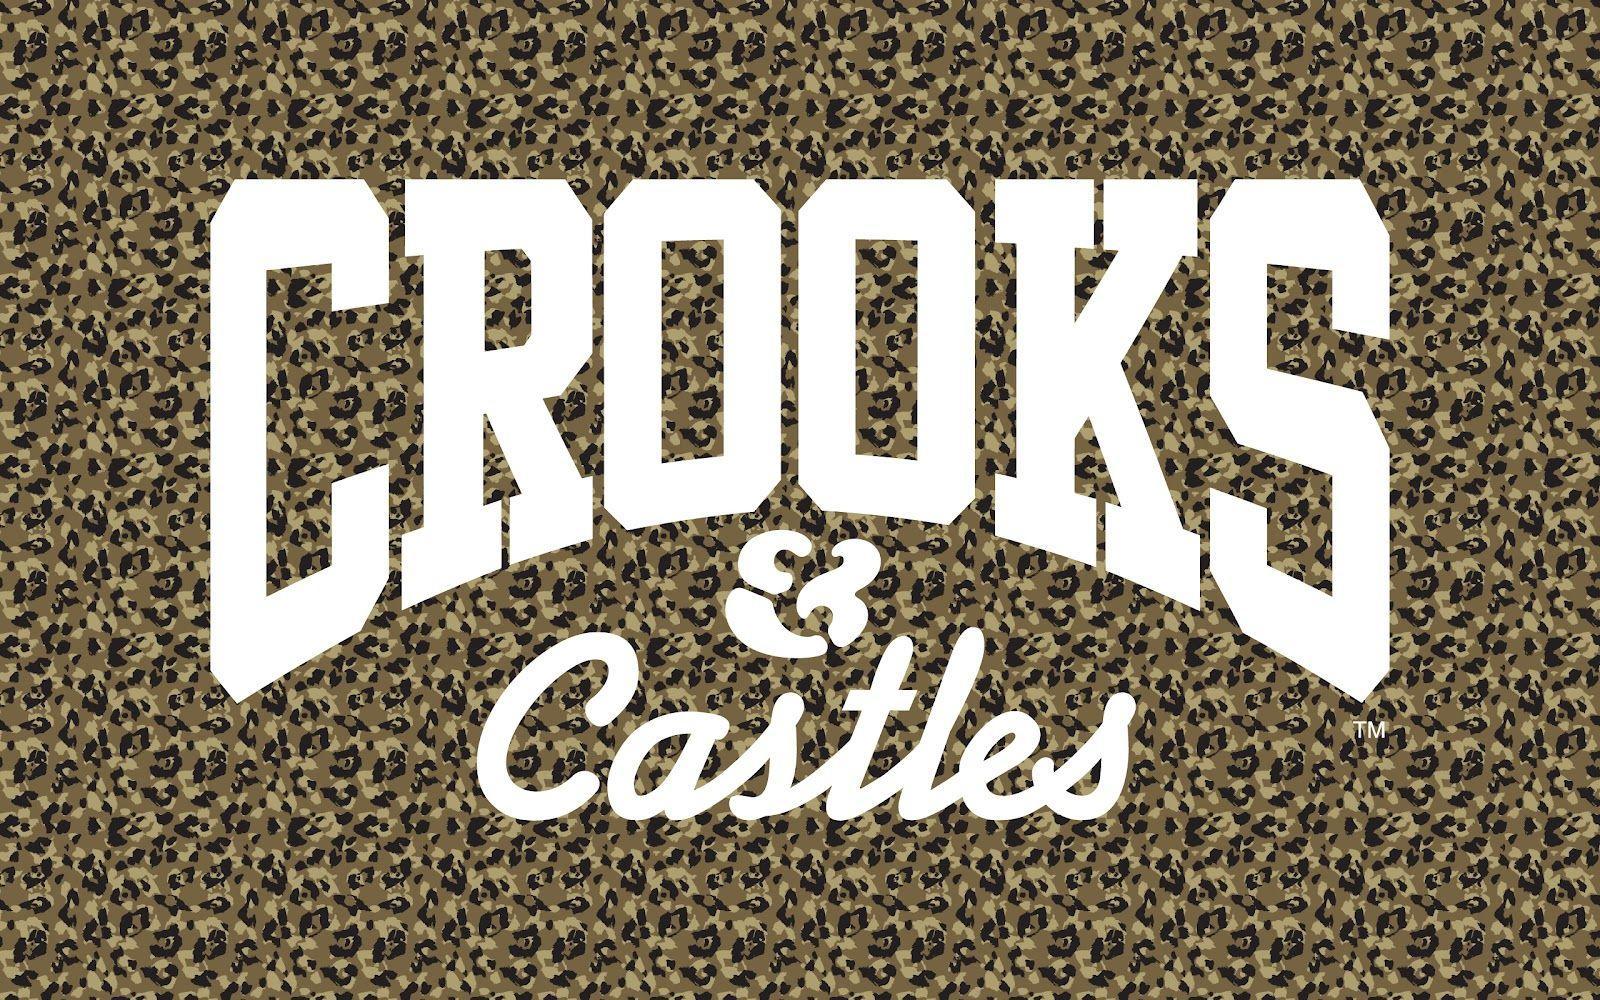 HD Wallpapers Crooks And Castles Air Gun Logo Tzcearecompress